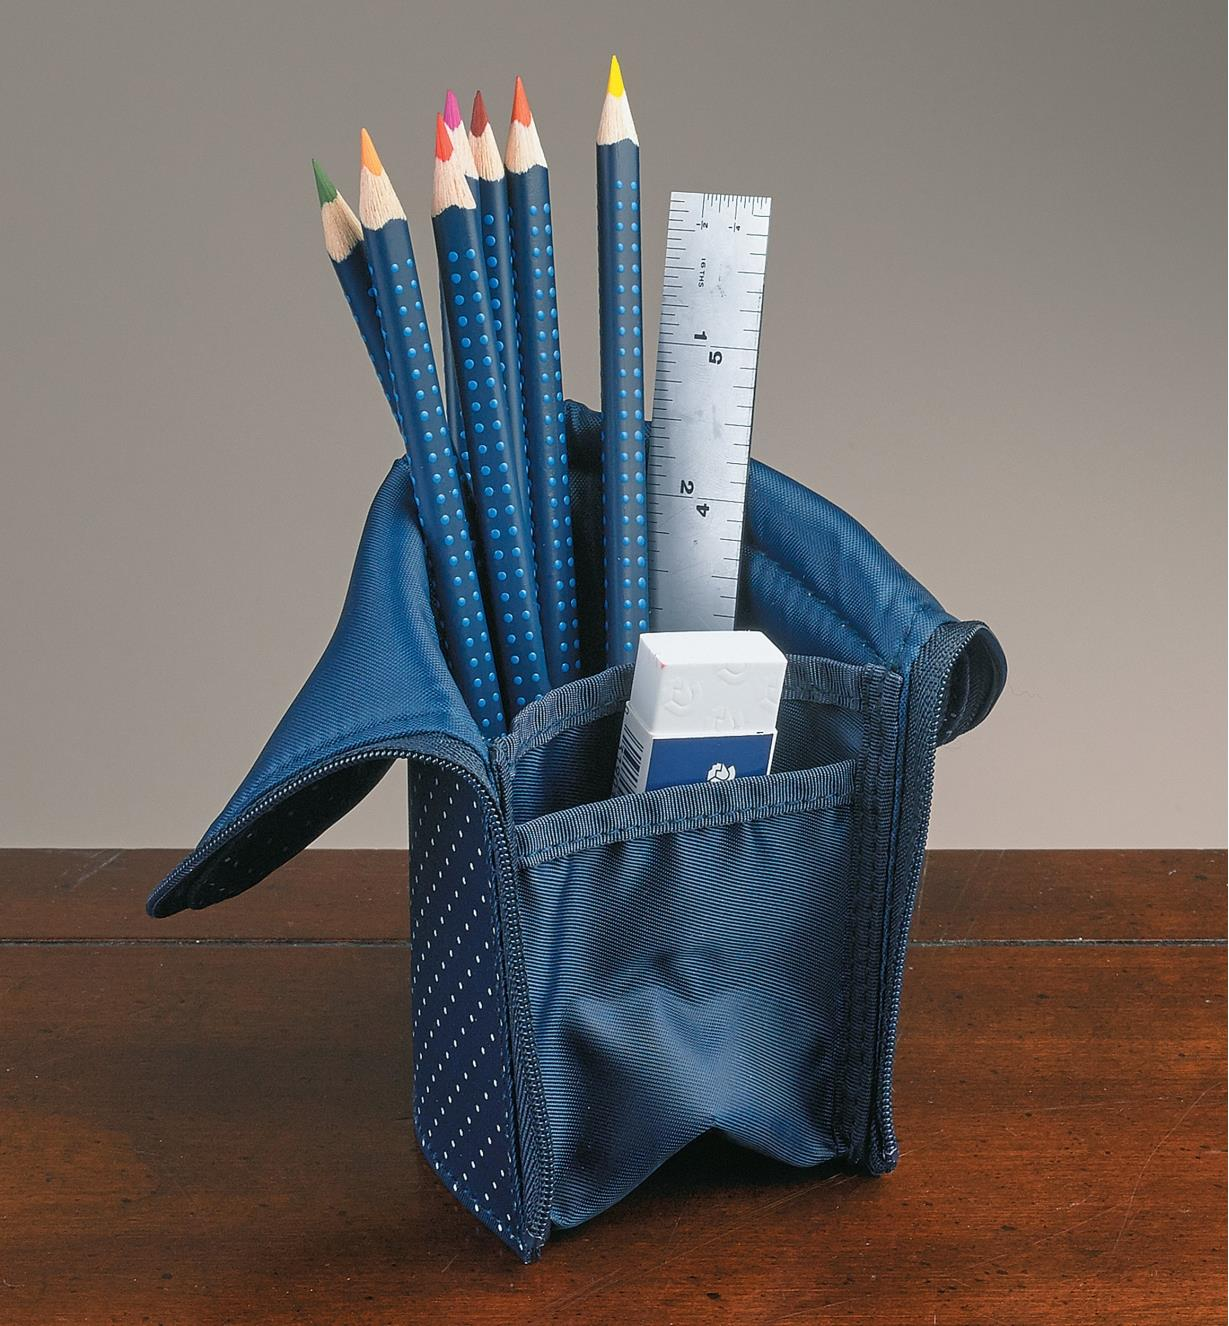 83U0416 - Étui à crayons vertical